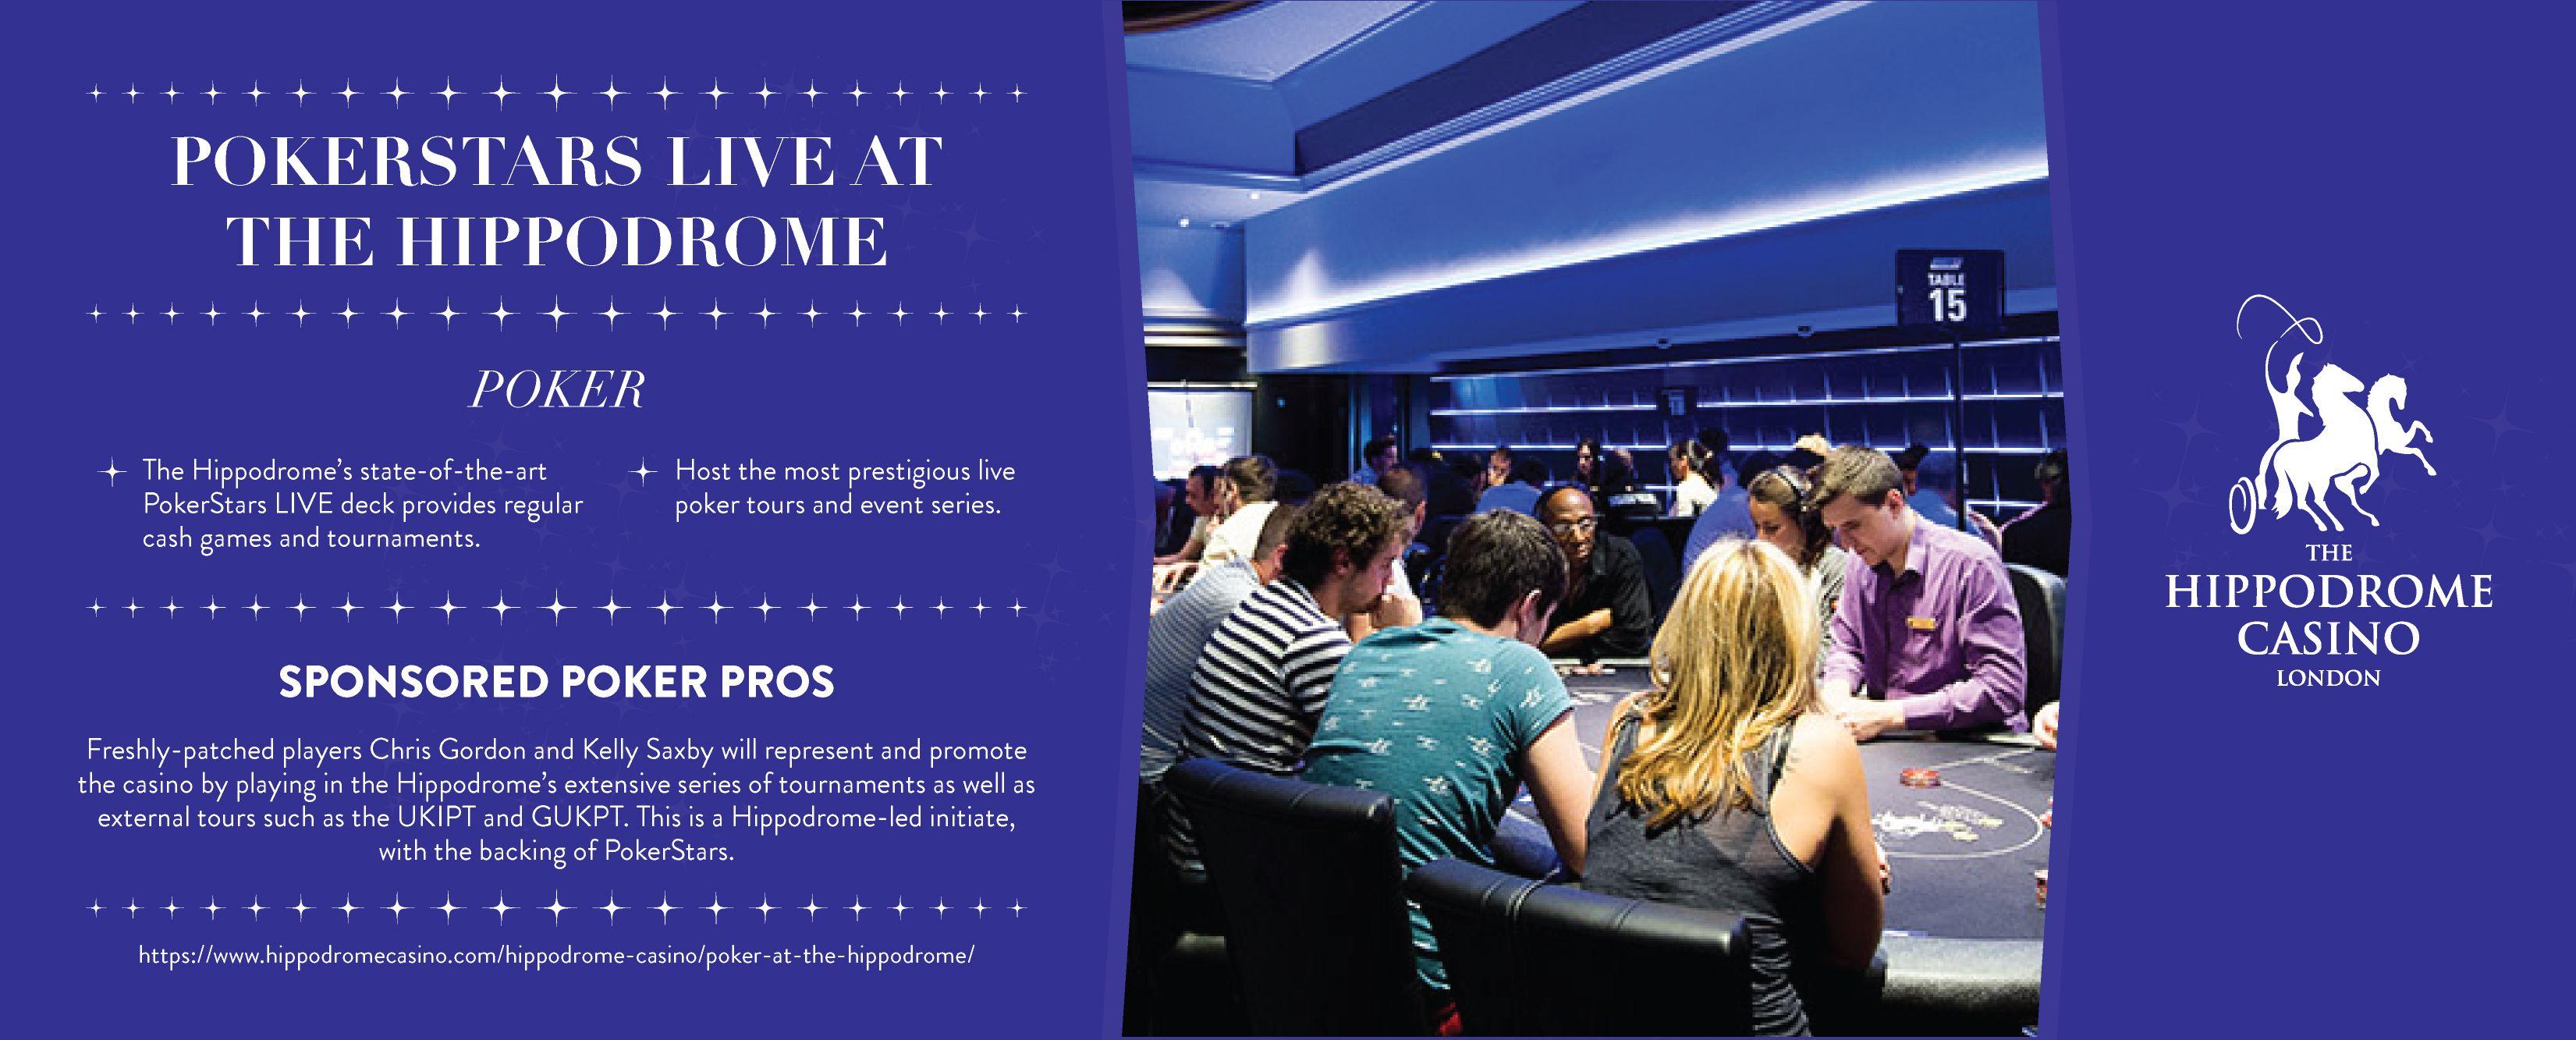 Hippodrome Poker Schedule